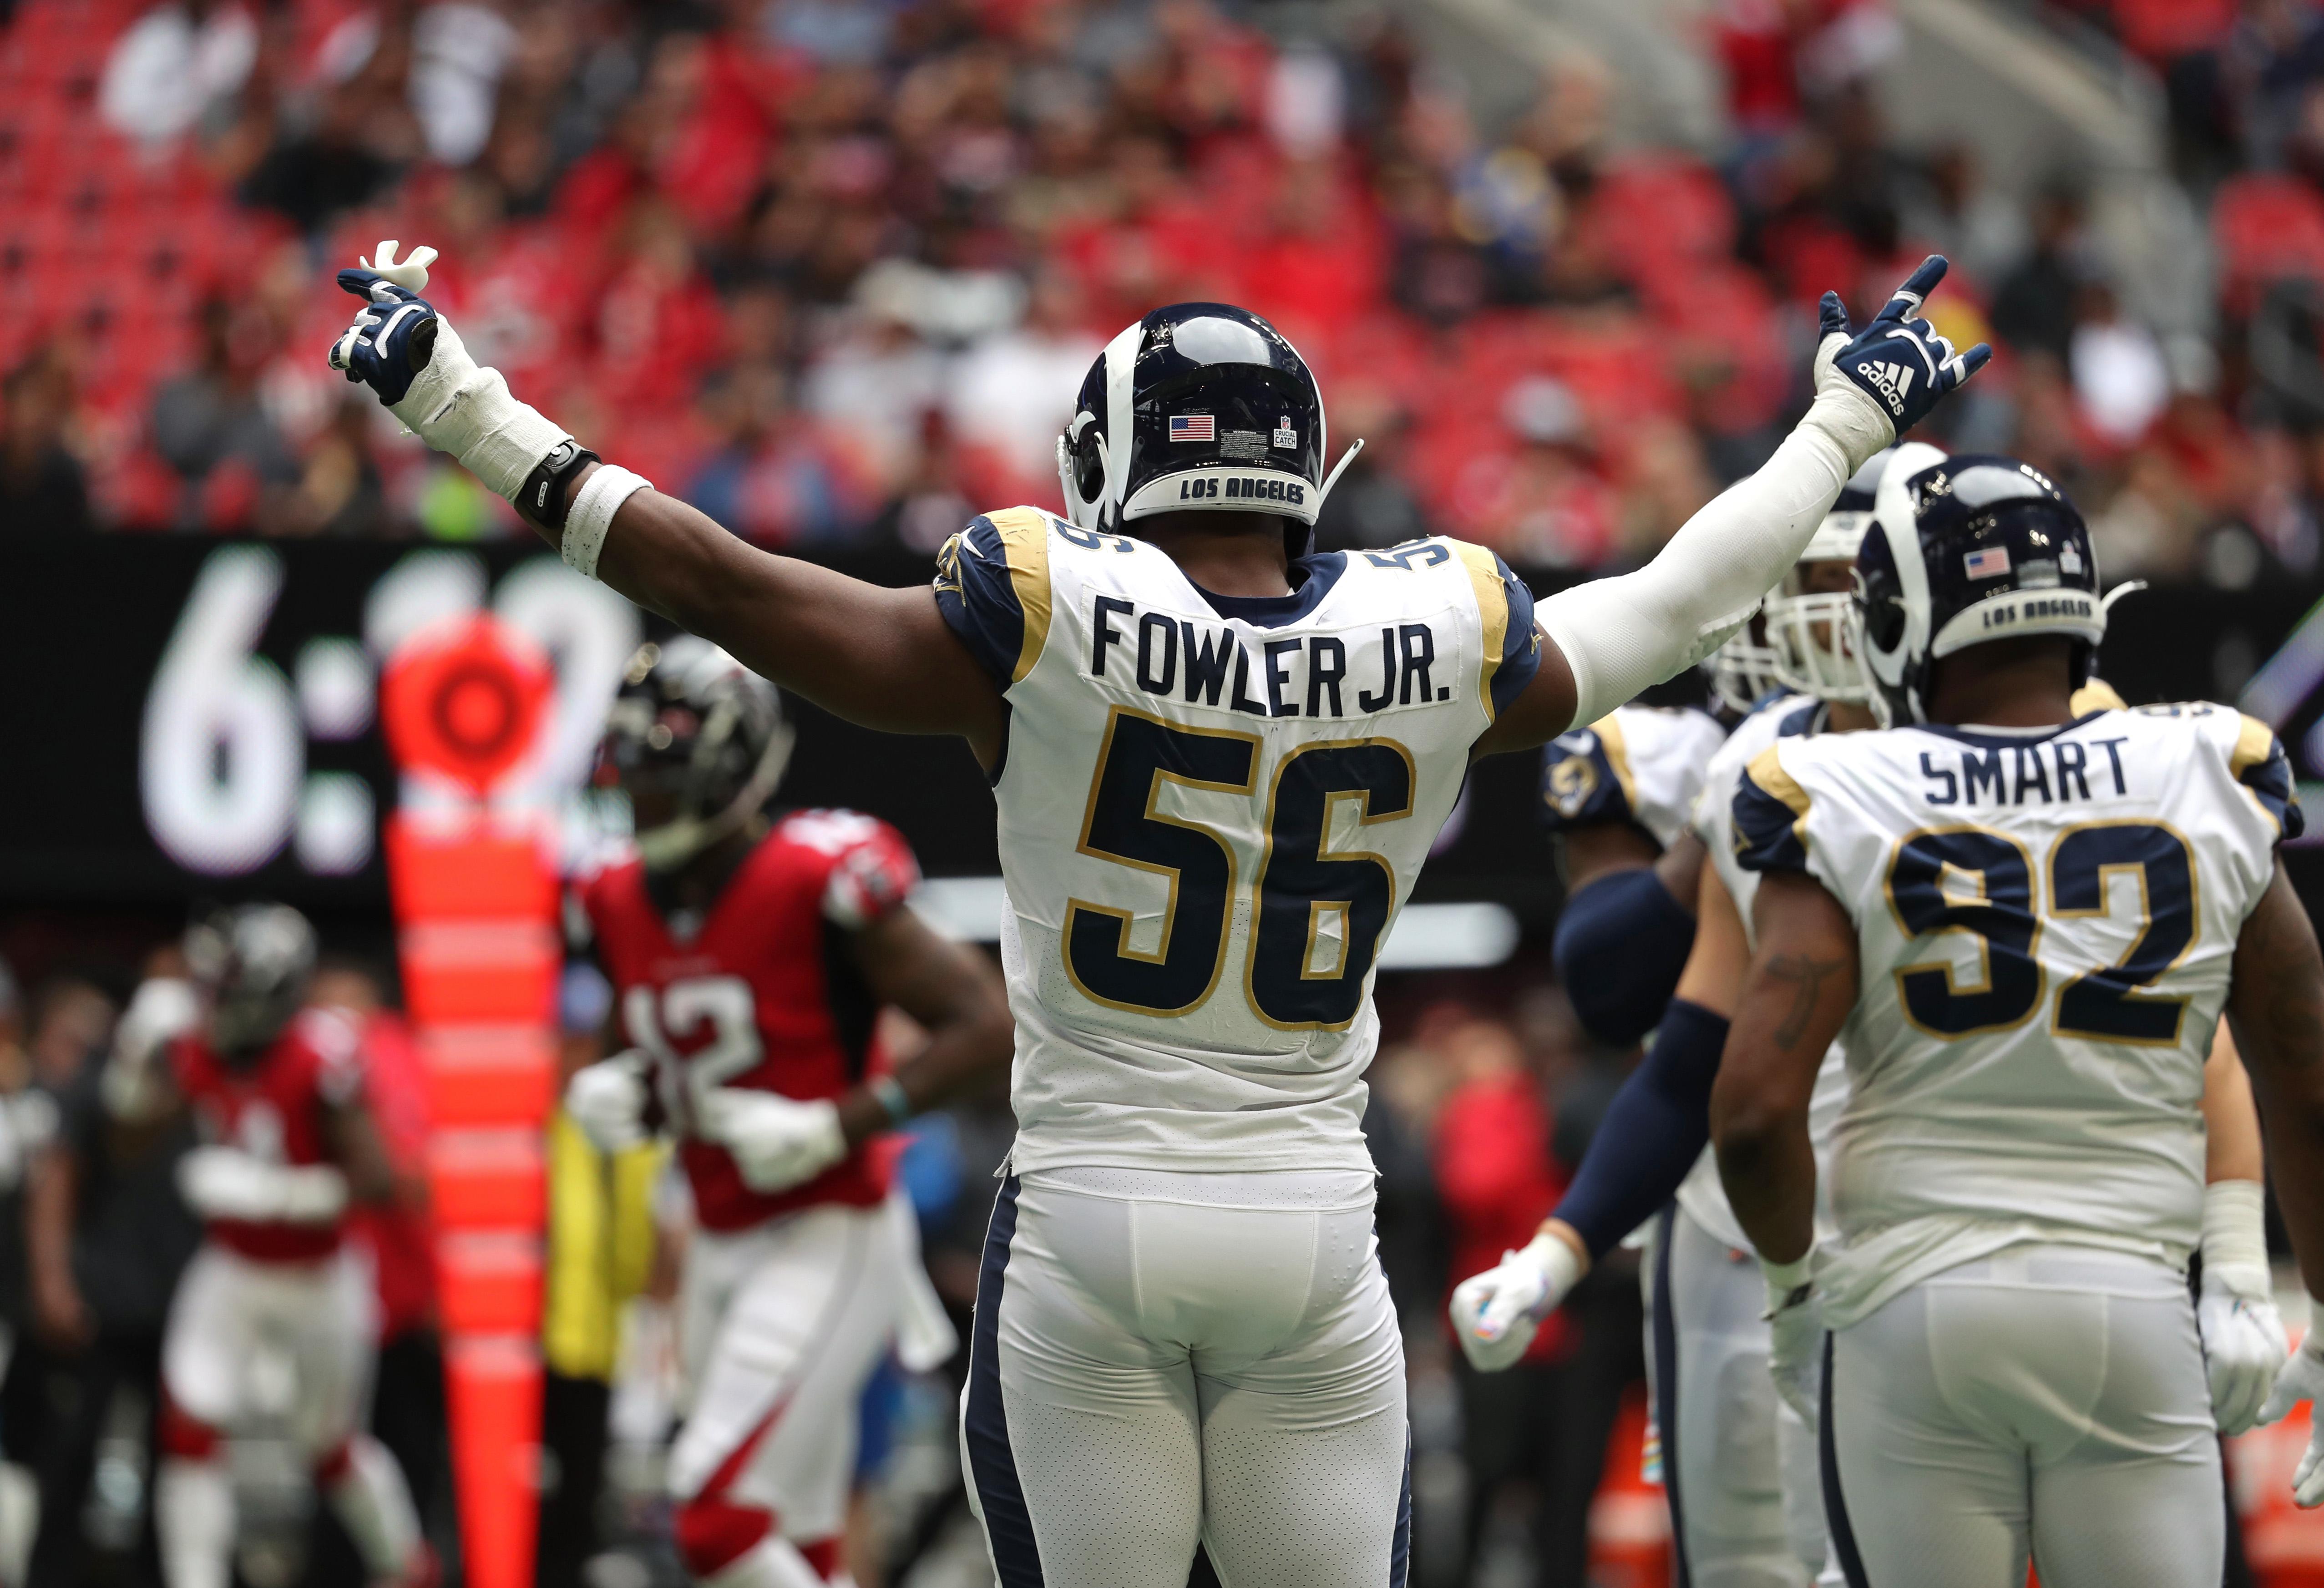 Los Angeles Rams EDGE Dante Fowler Jr. celebrates a sack of Atlanta Falcons QB Matt Ryan in Week 7, Oct. 20, 2019.